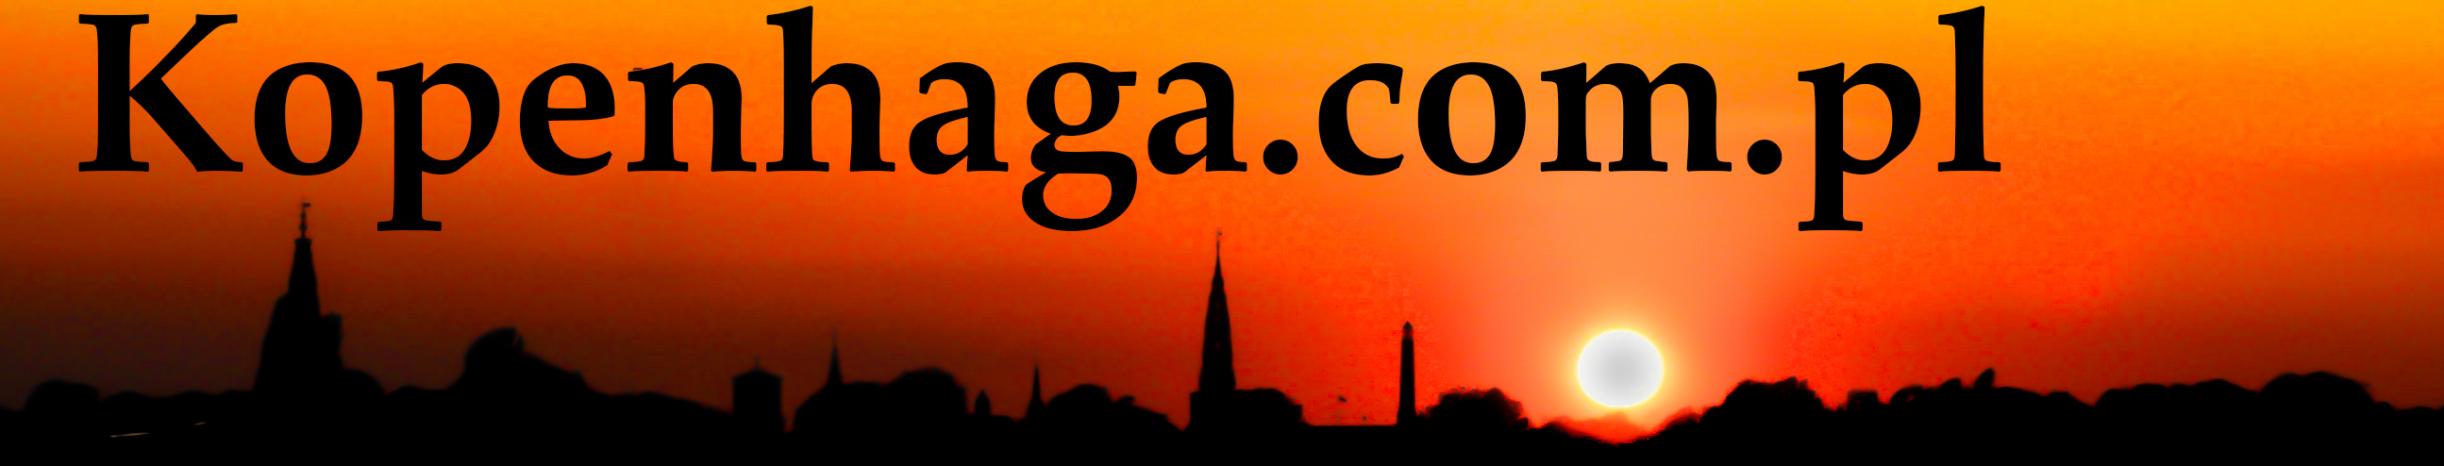 Banner Kopenhaga.com.pl